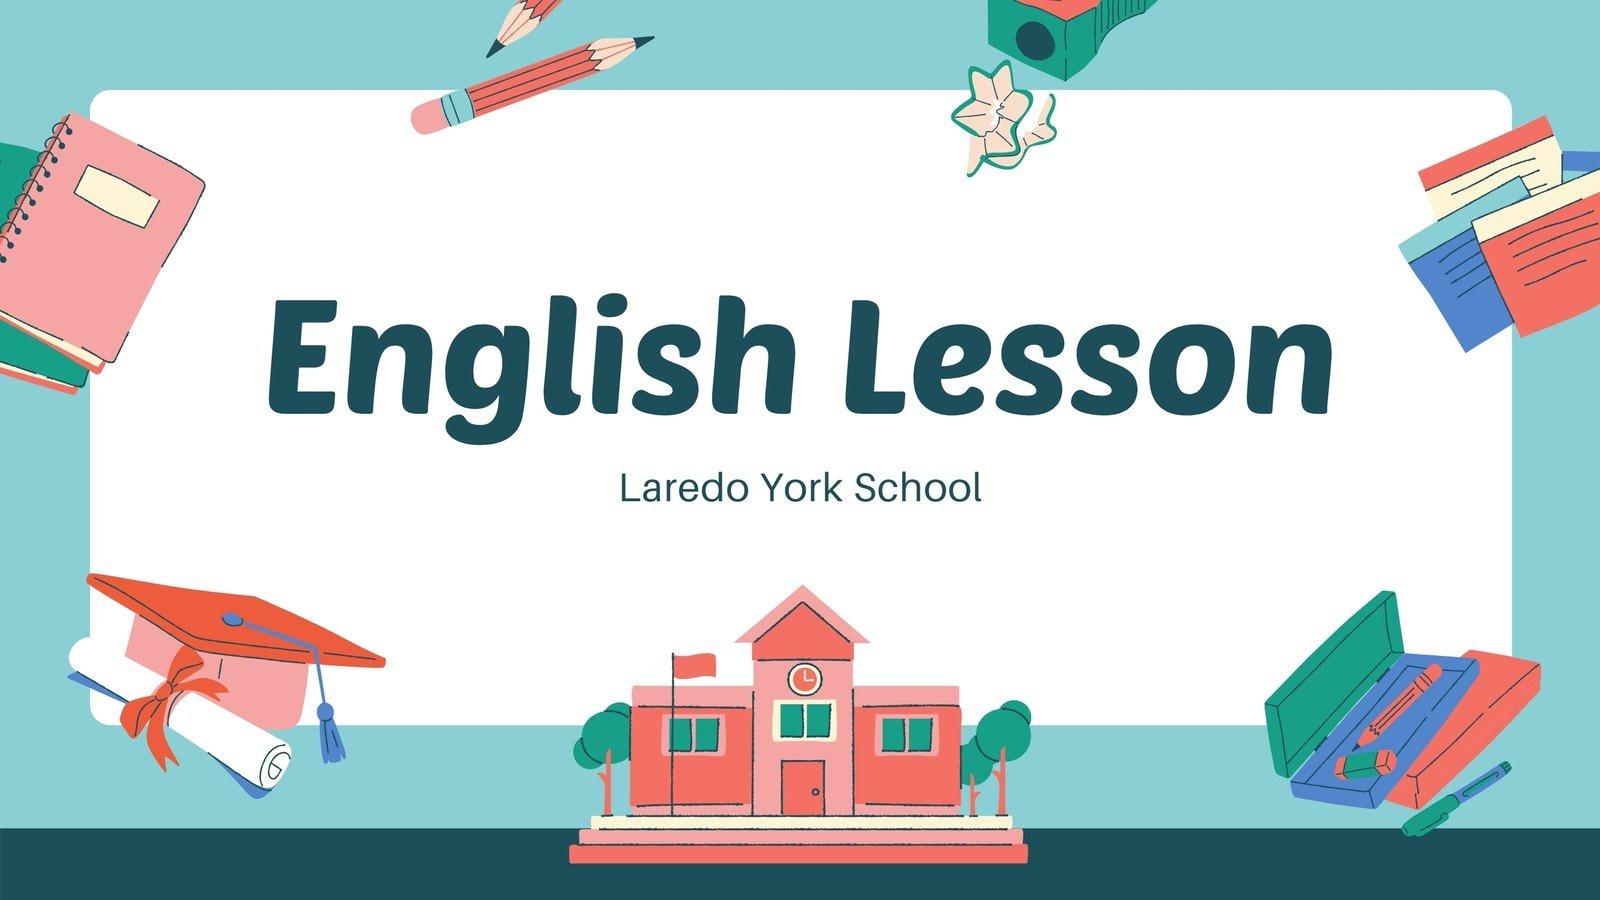 Peach and Blue Illustration English Class Education Video Presentation